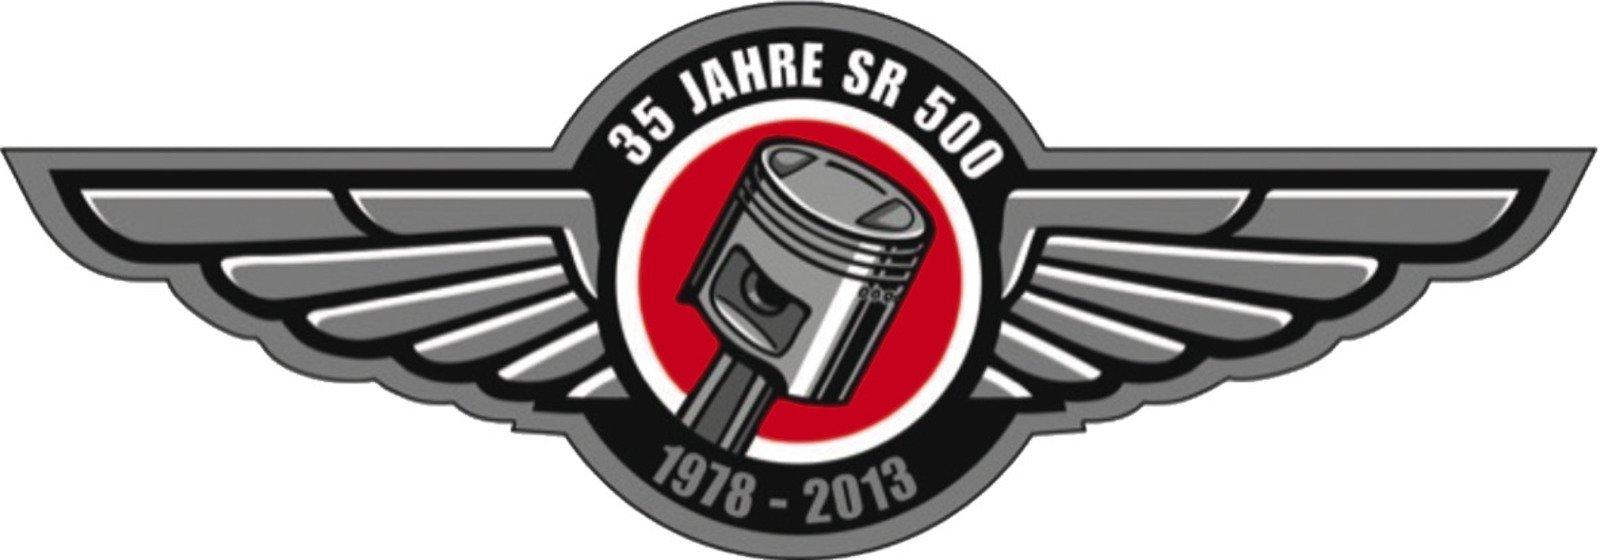 35th Anniversary Sticker SR500 90235